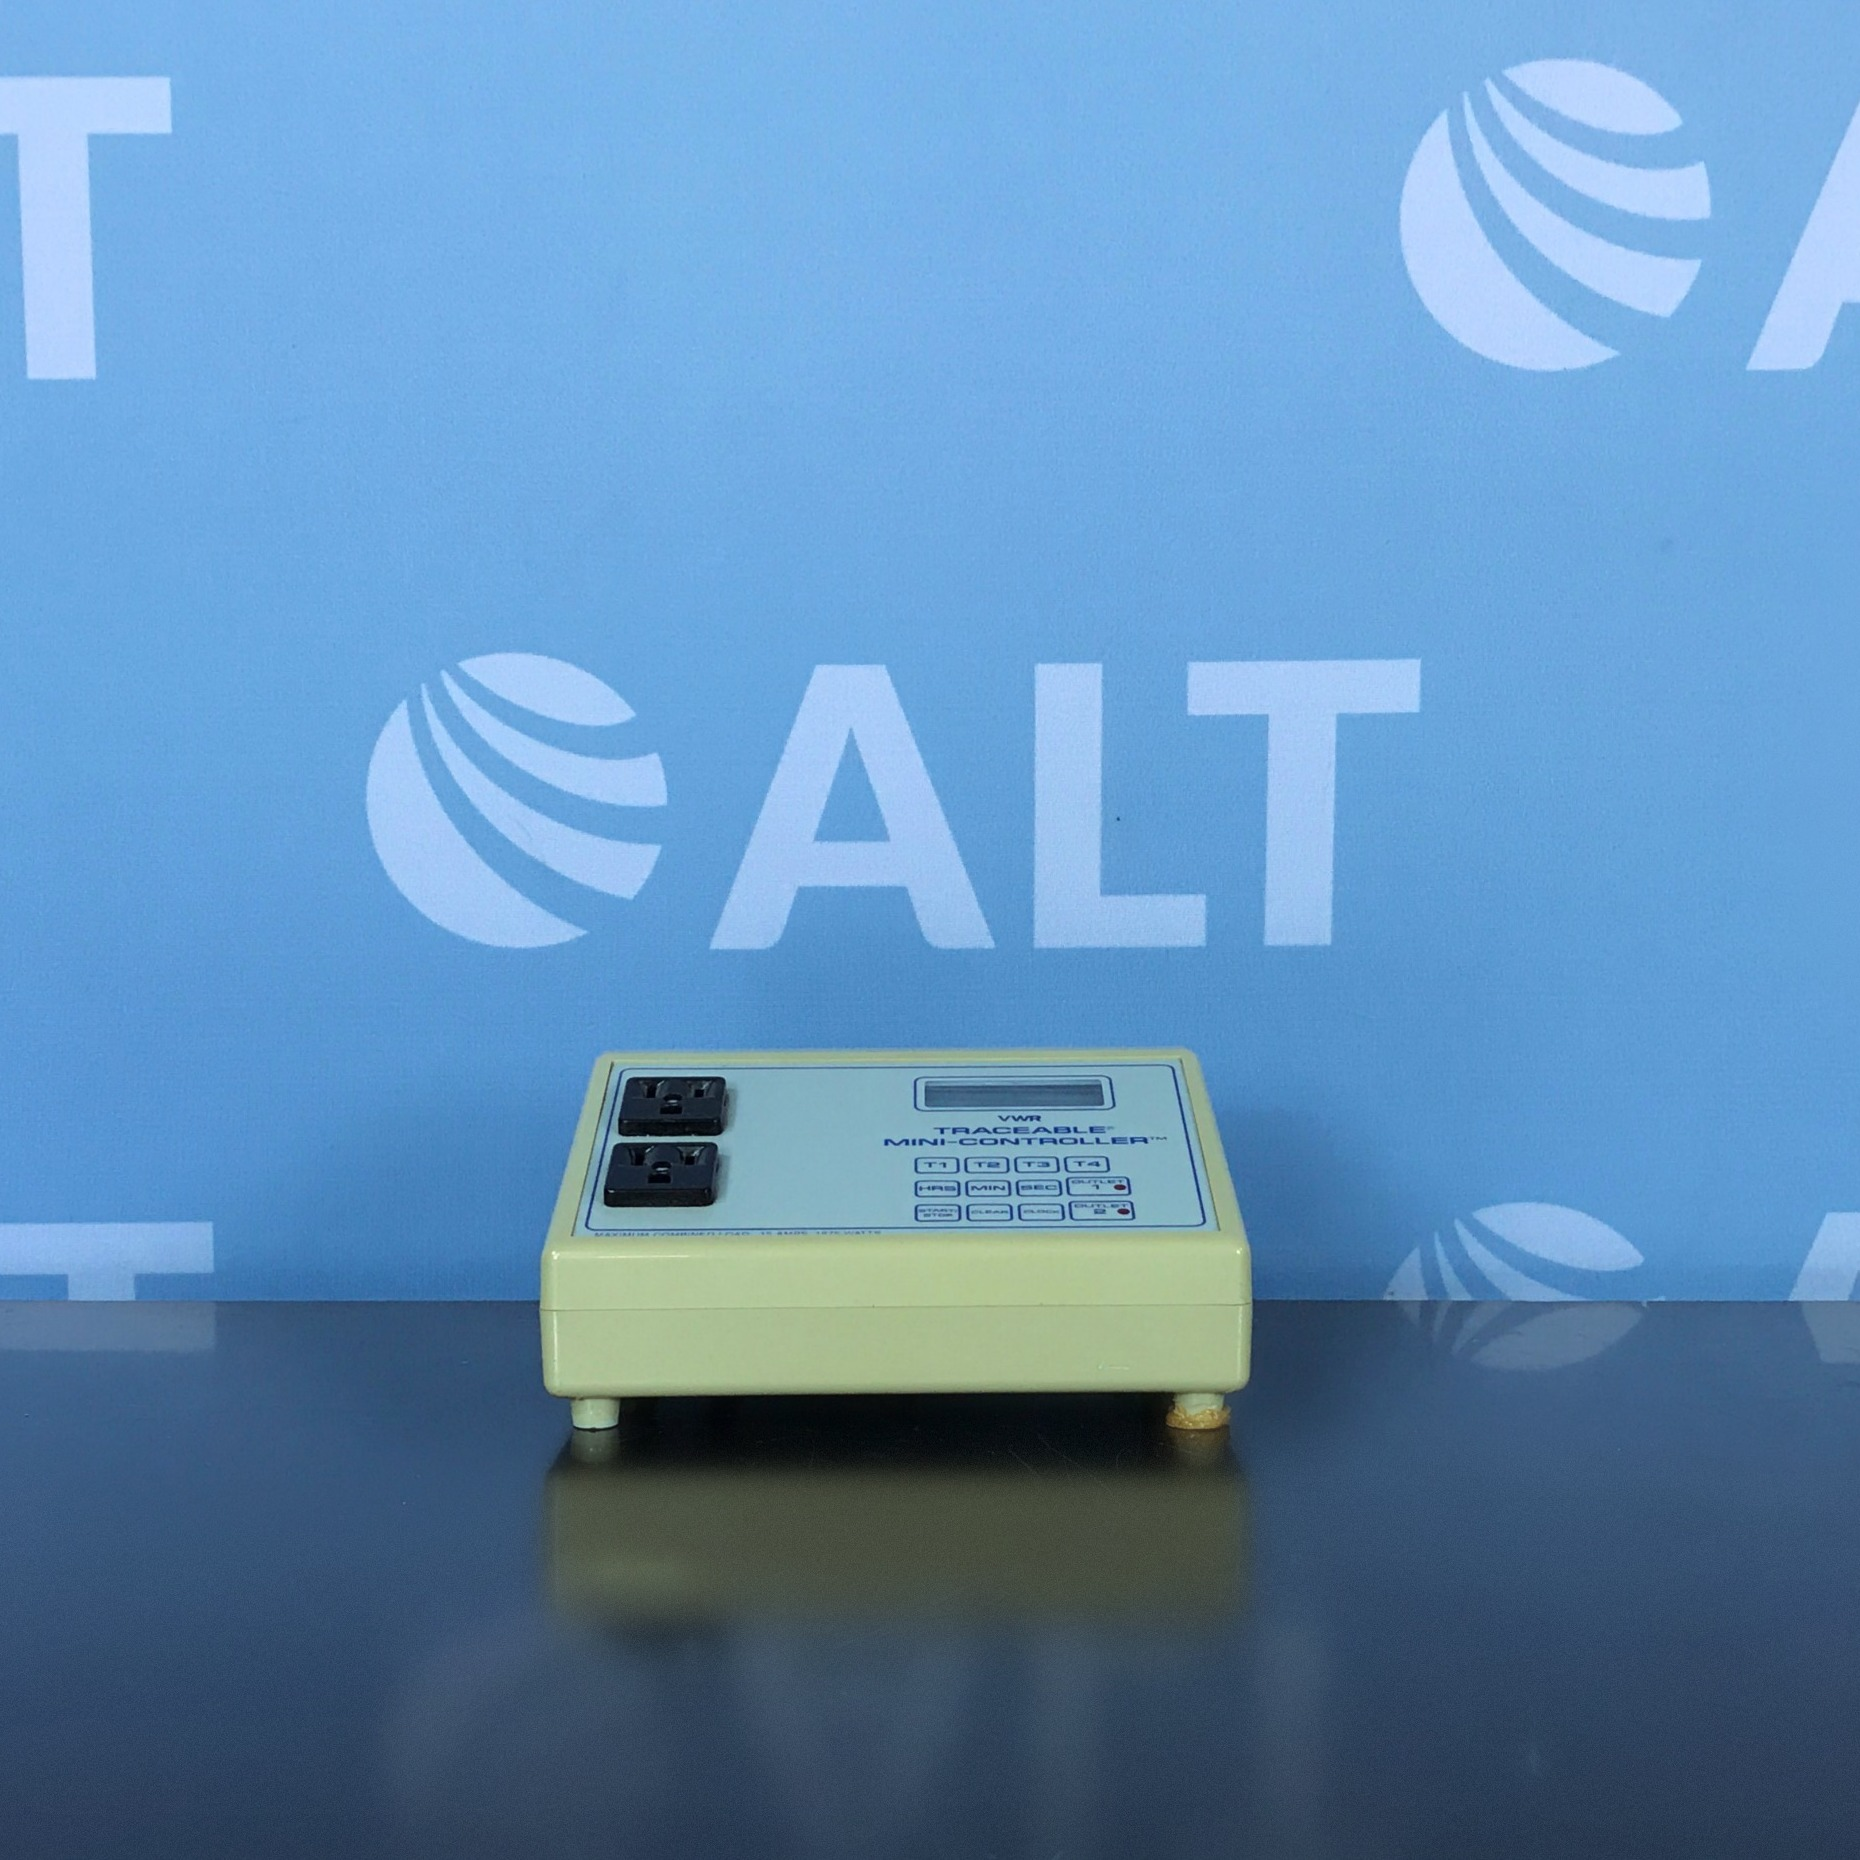 VWR Traceable 4-Channel Mini-controller Image